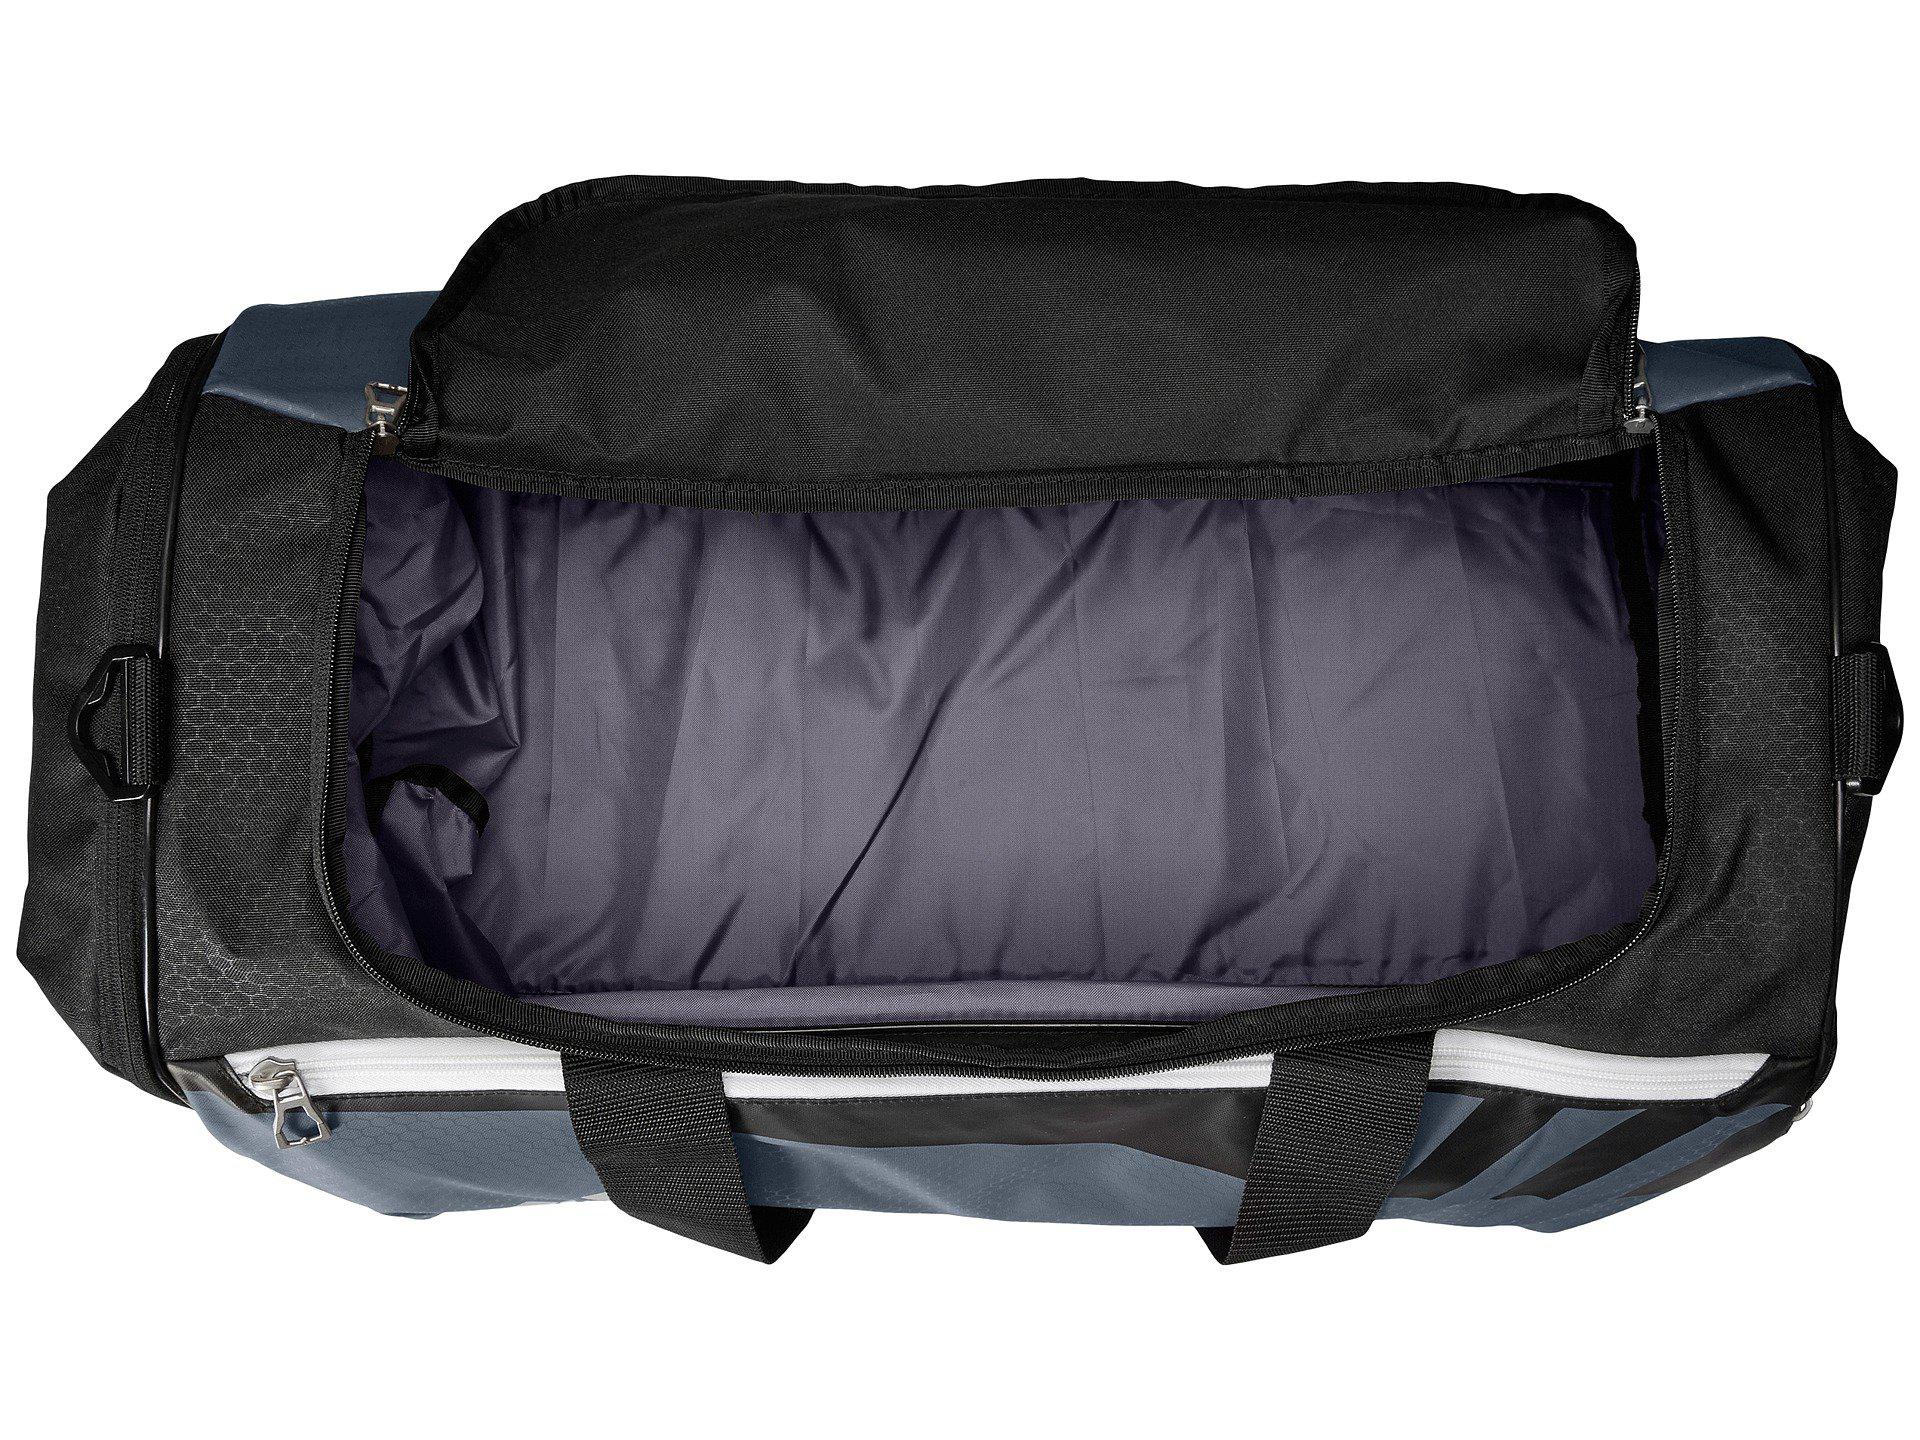 3556e9c2d2 Lyst - Adidas Team Issue Medium Duffel (black silver) Duffel Bags in ...